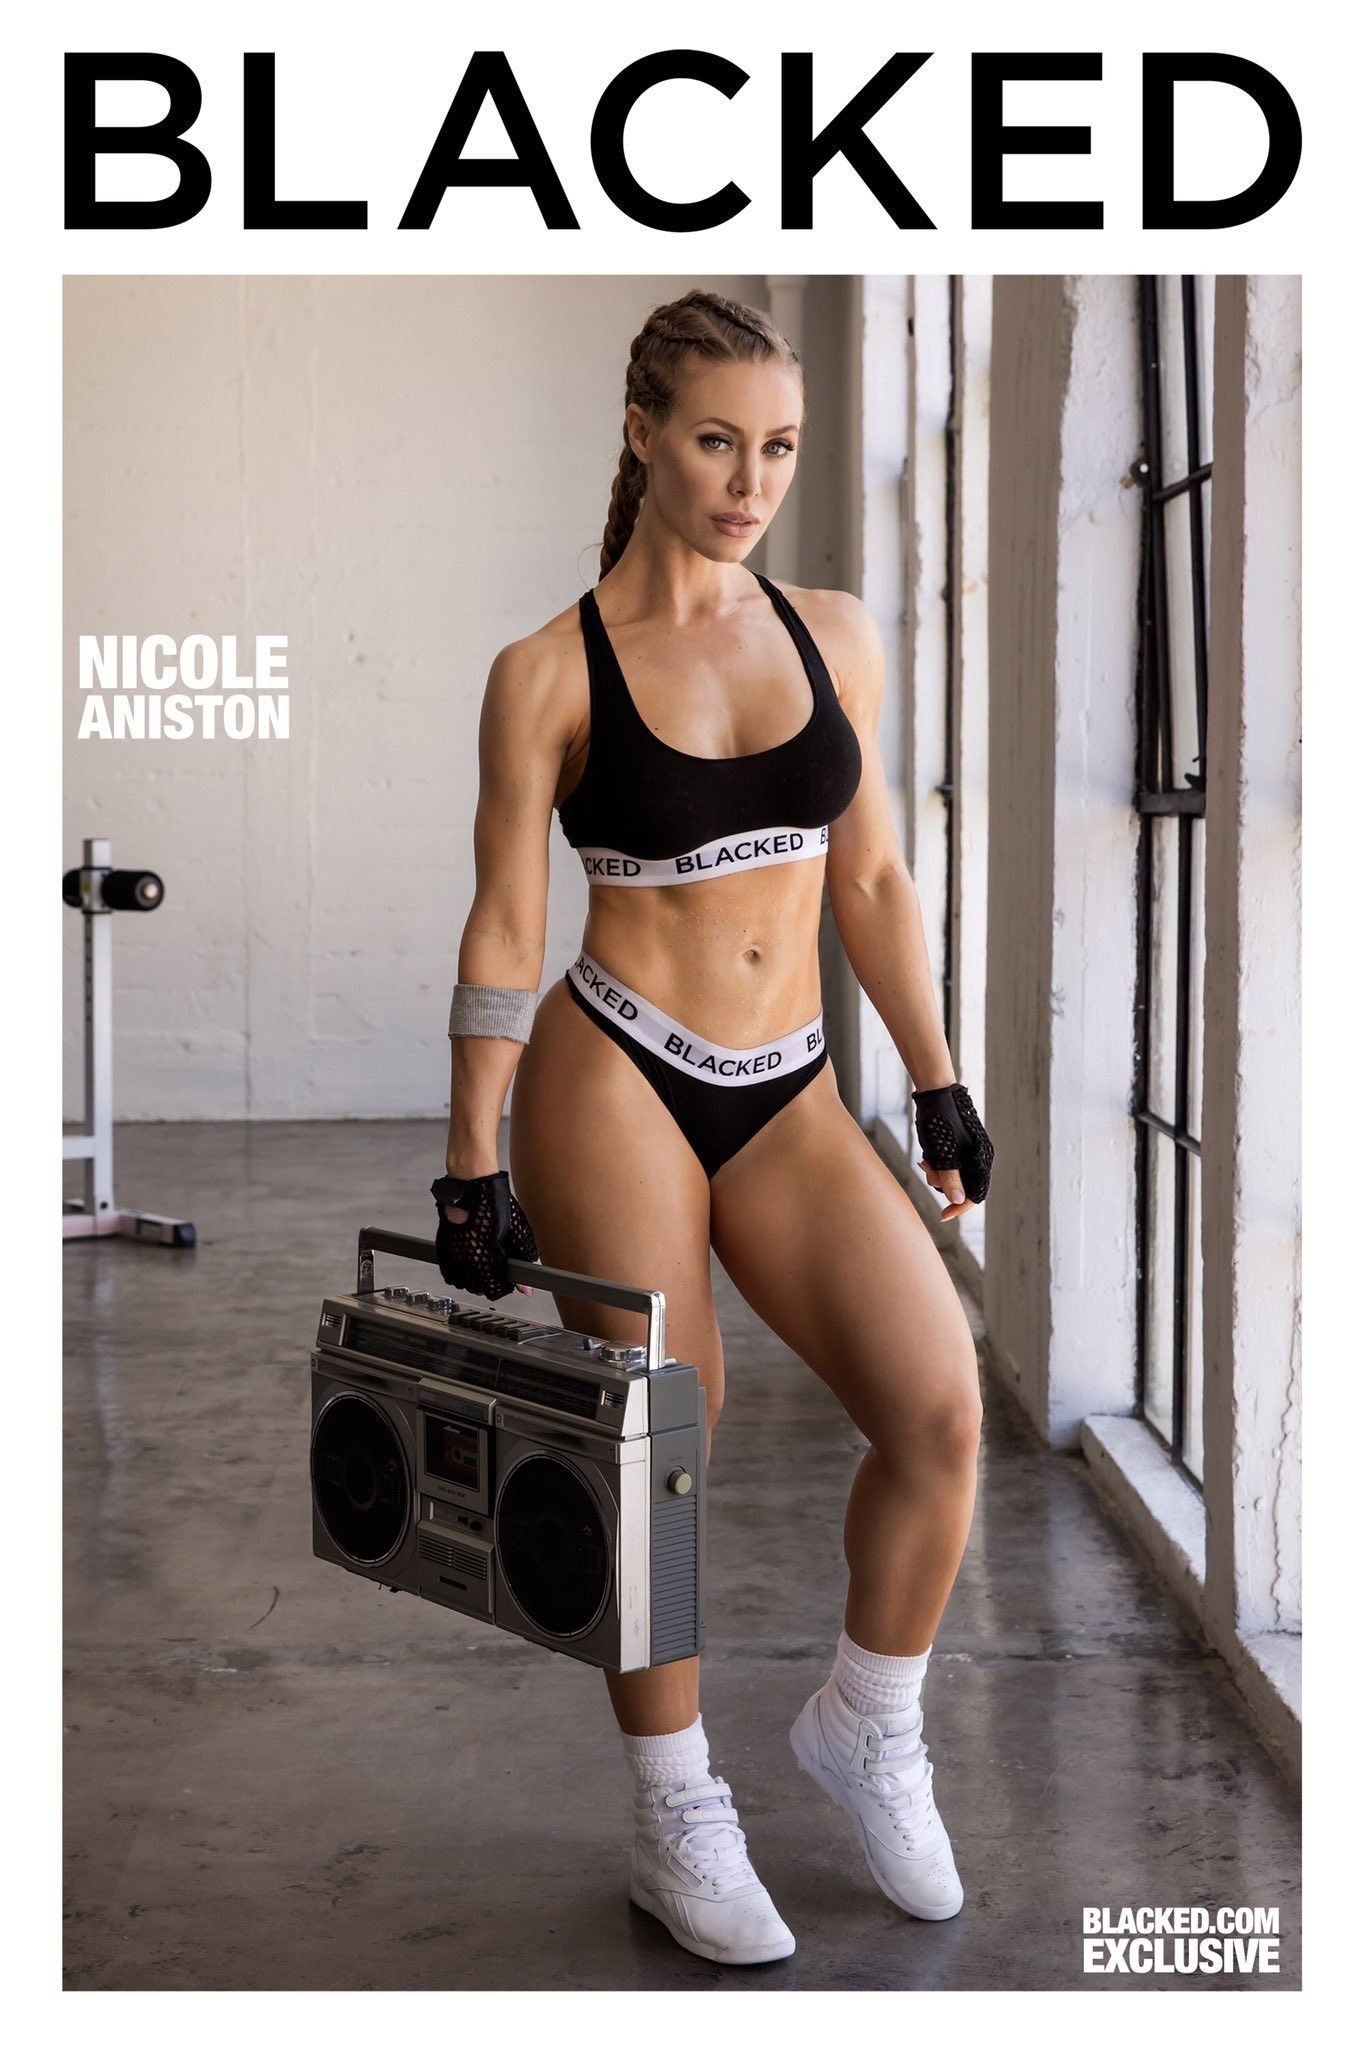 Nicole aniston gym